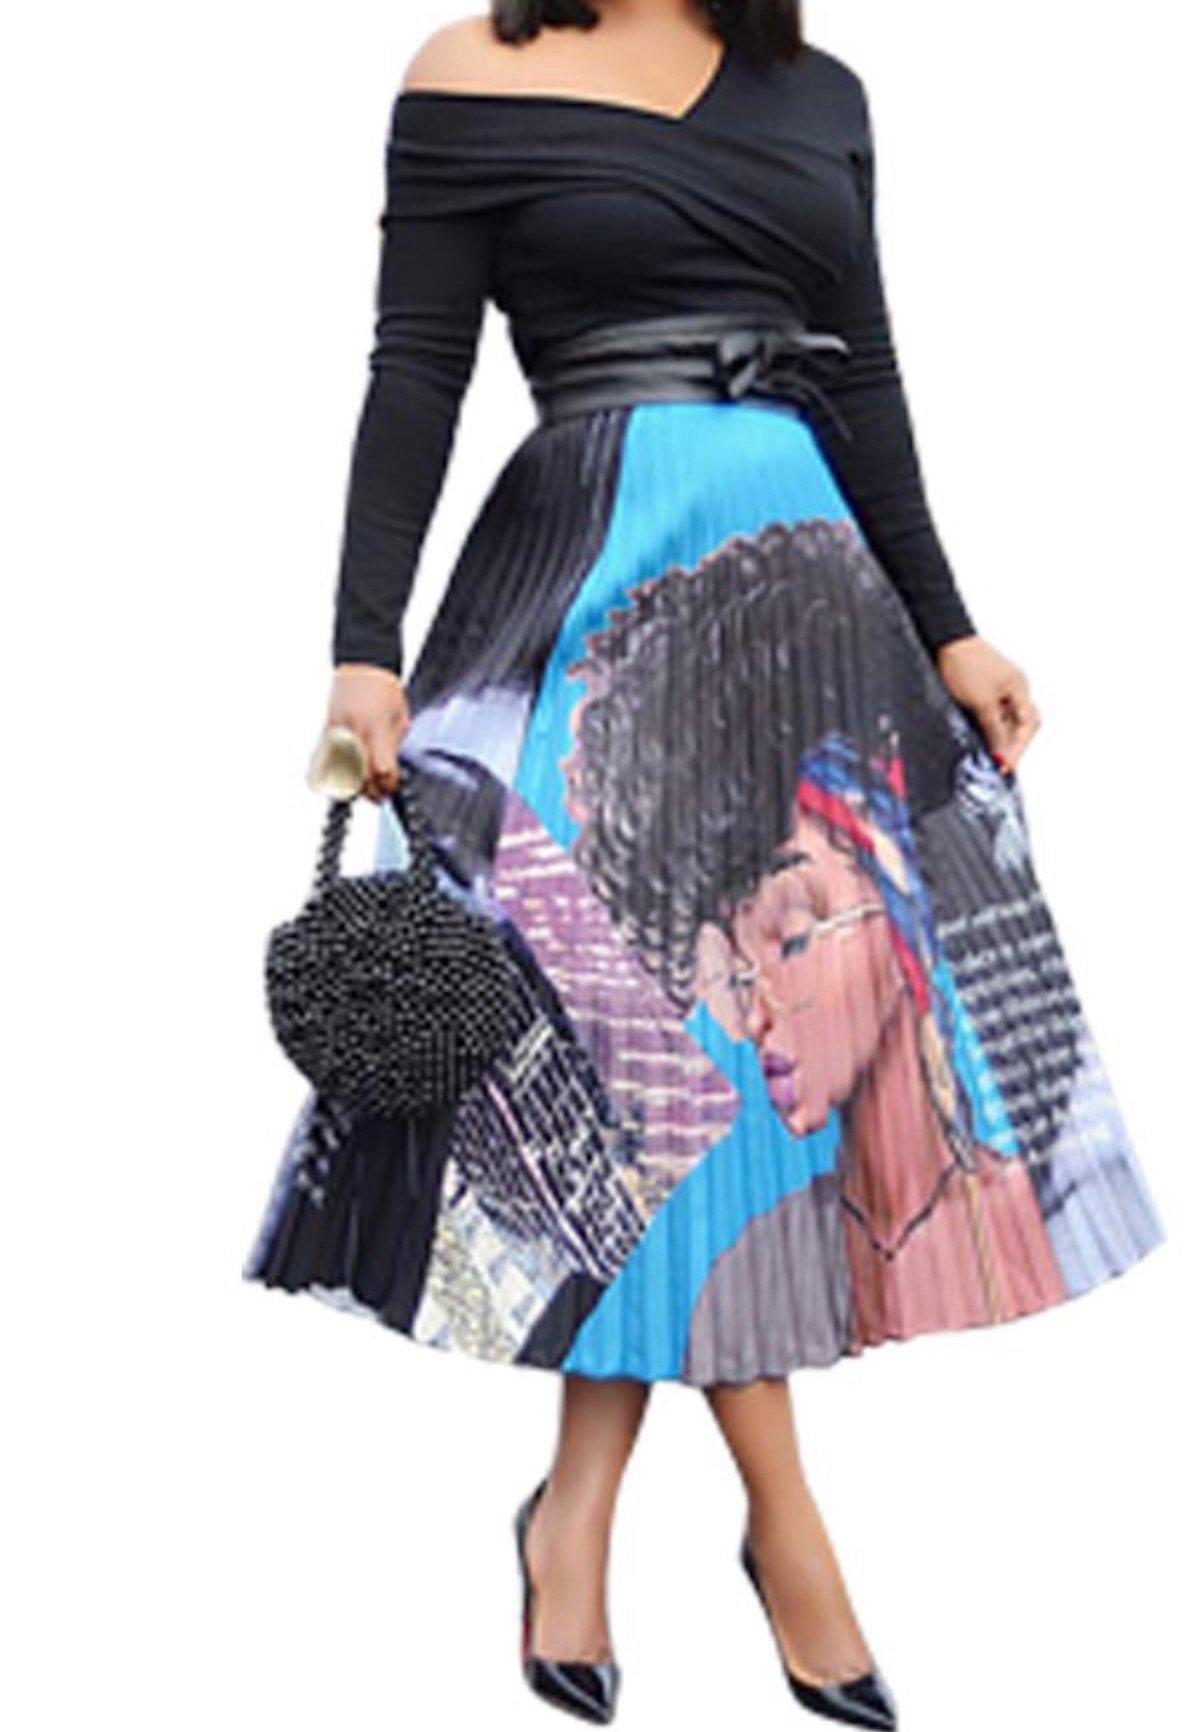 Image of Beauty skirt